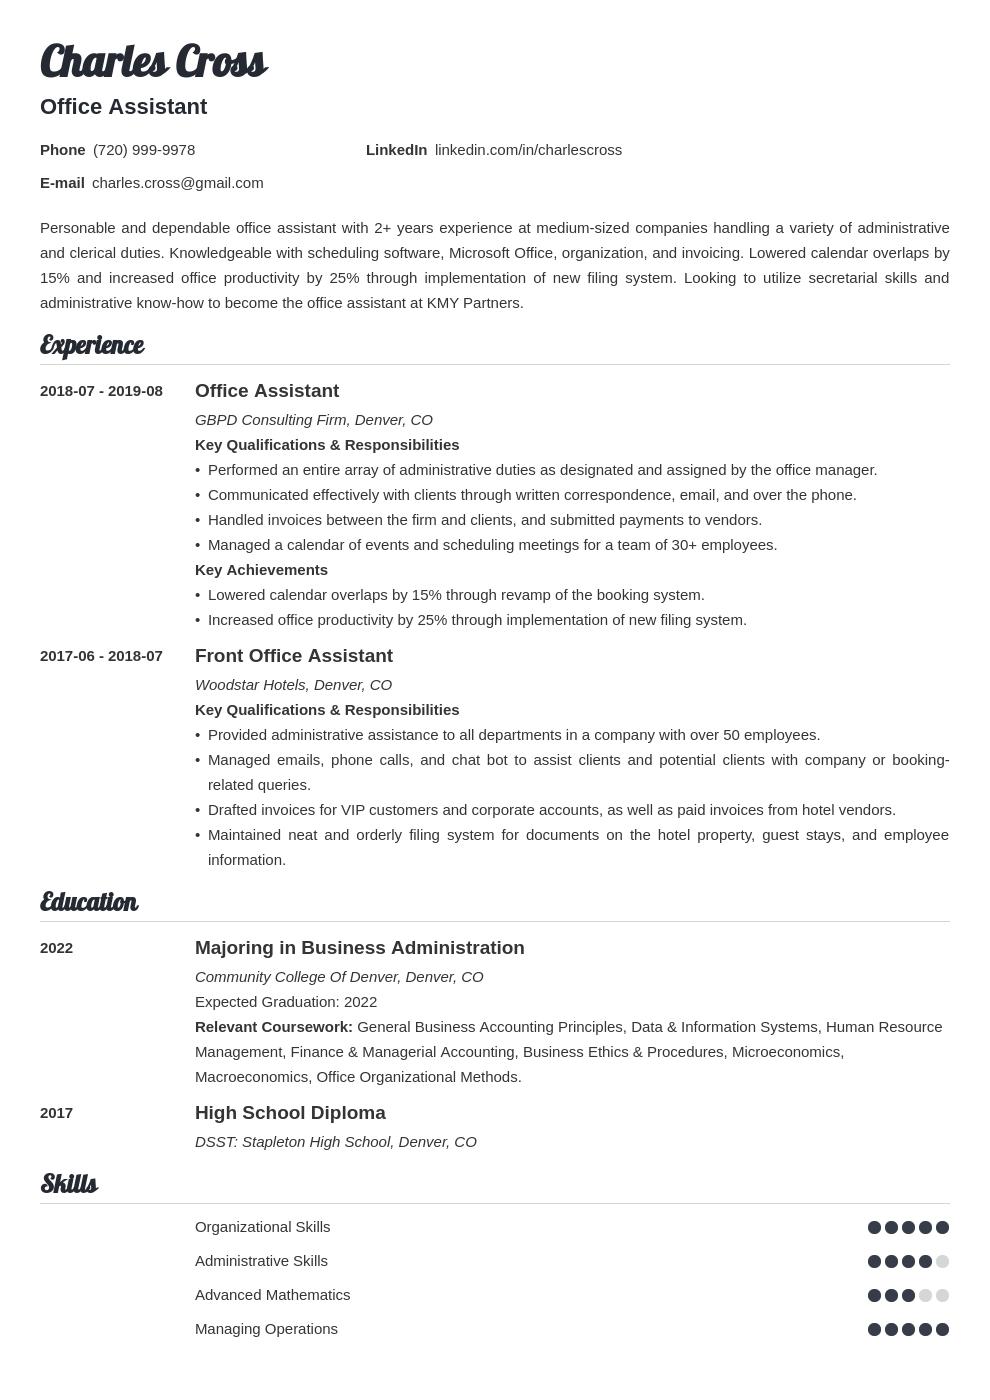 office assistant template valera uk